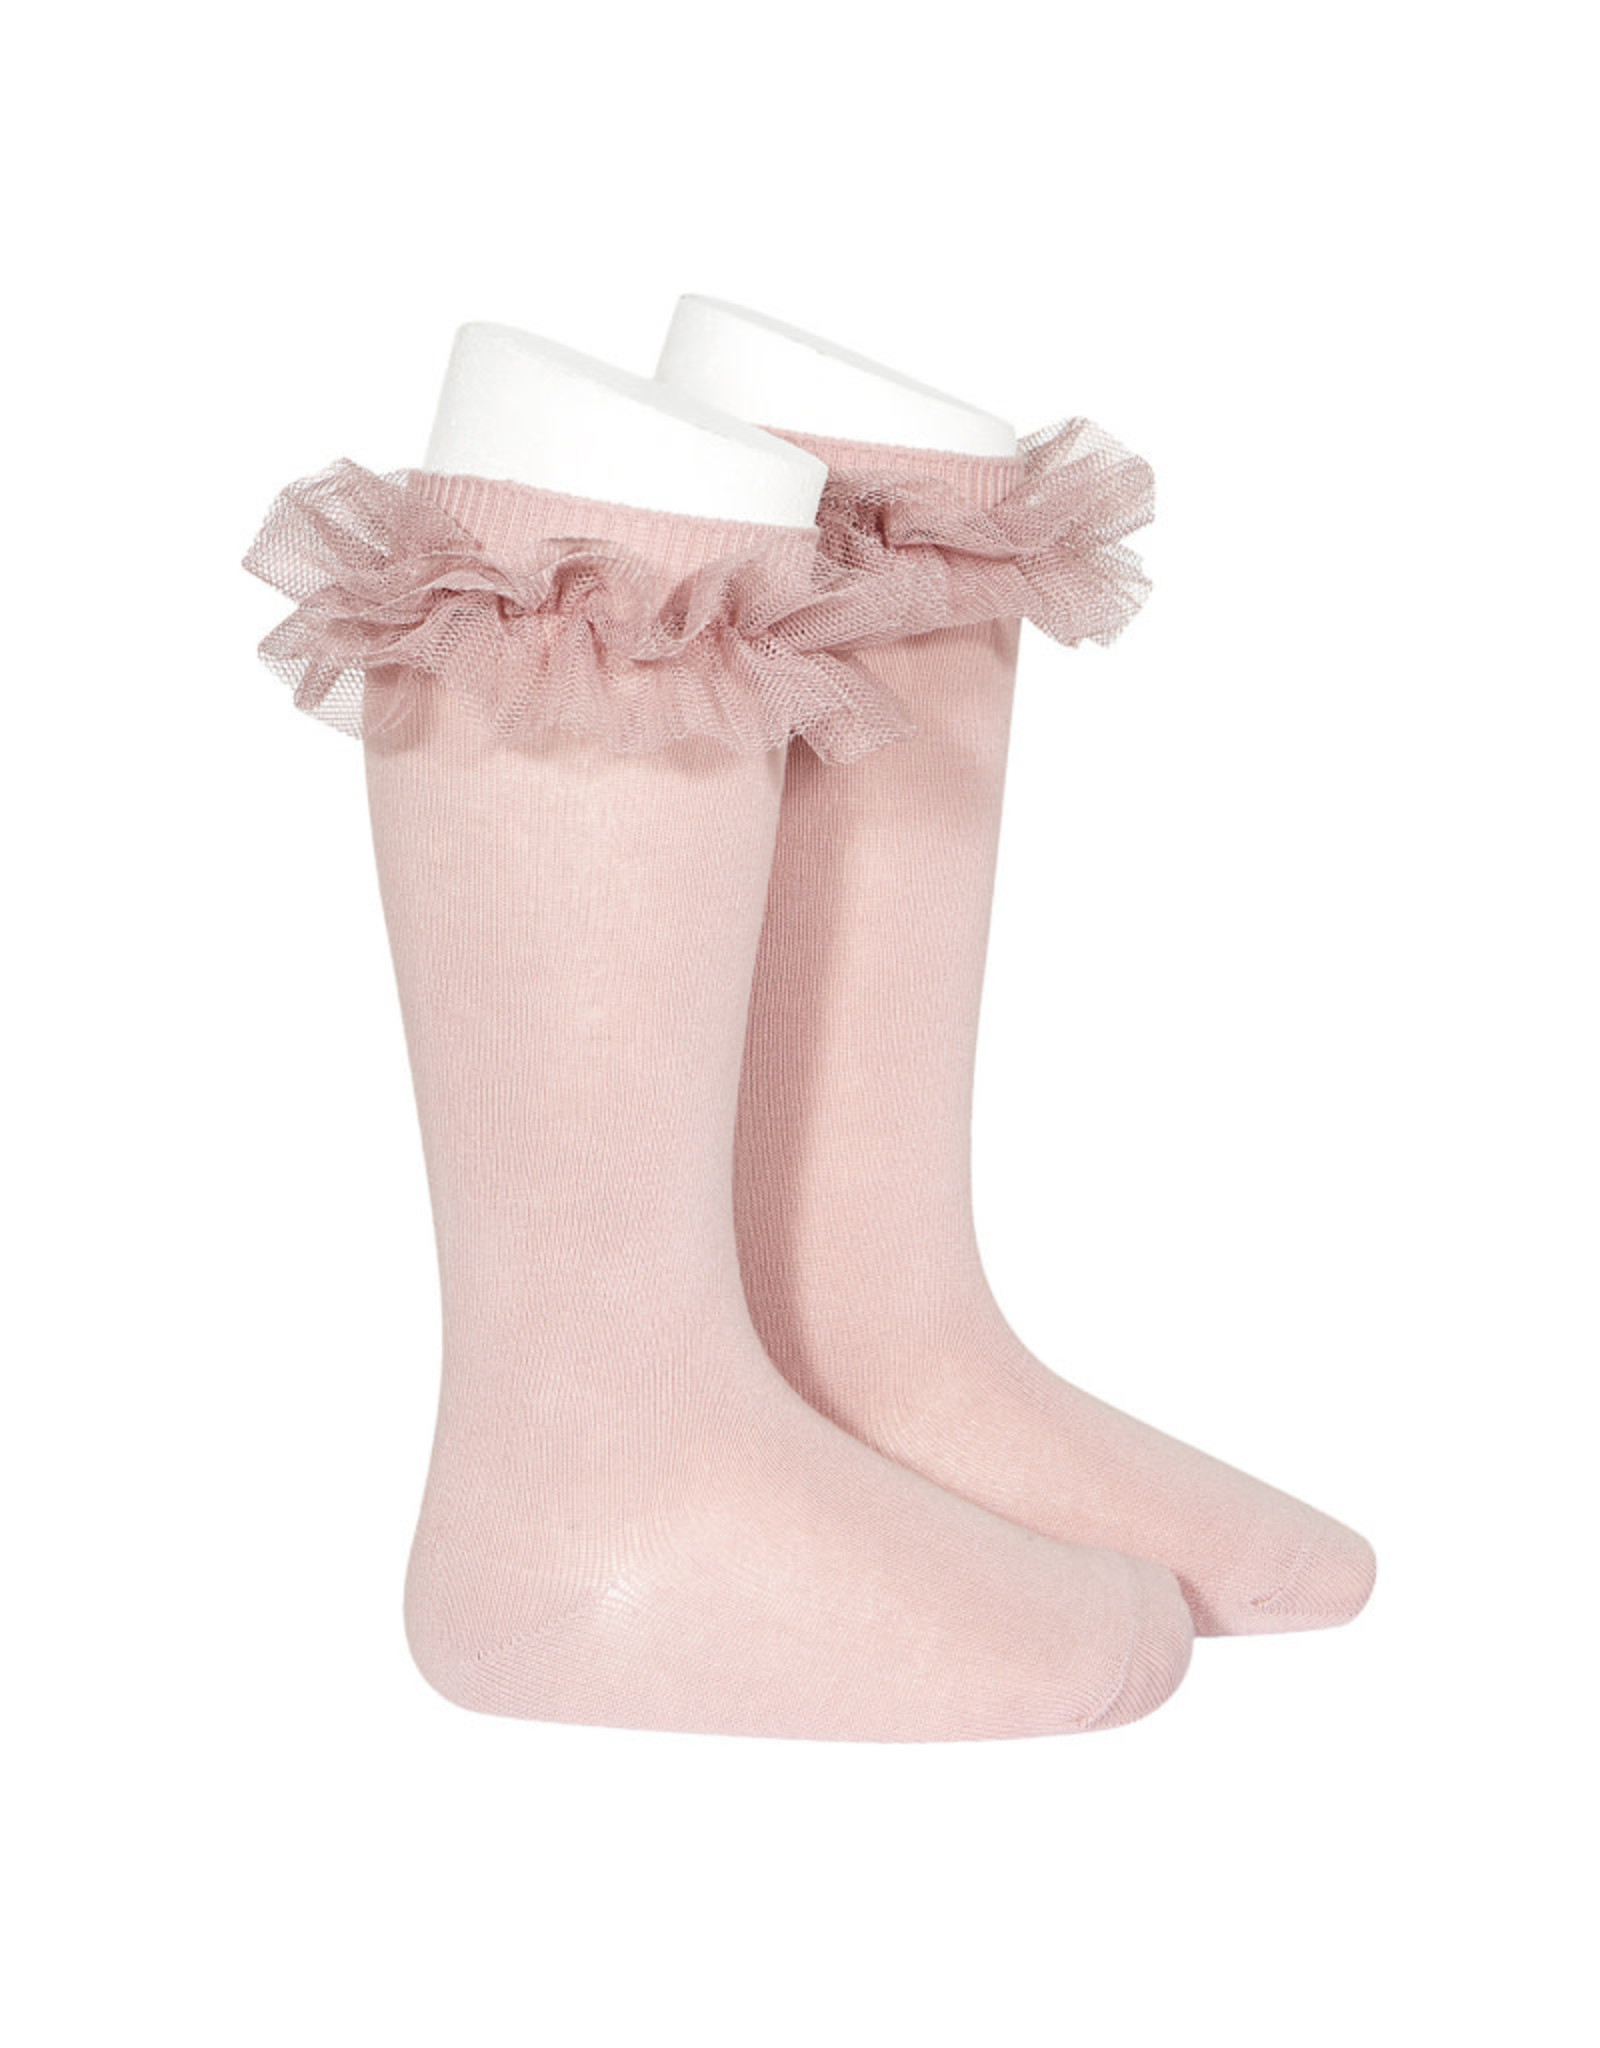 CONDOR Pale Pink Tulle Knee Socks